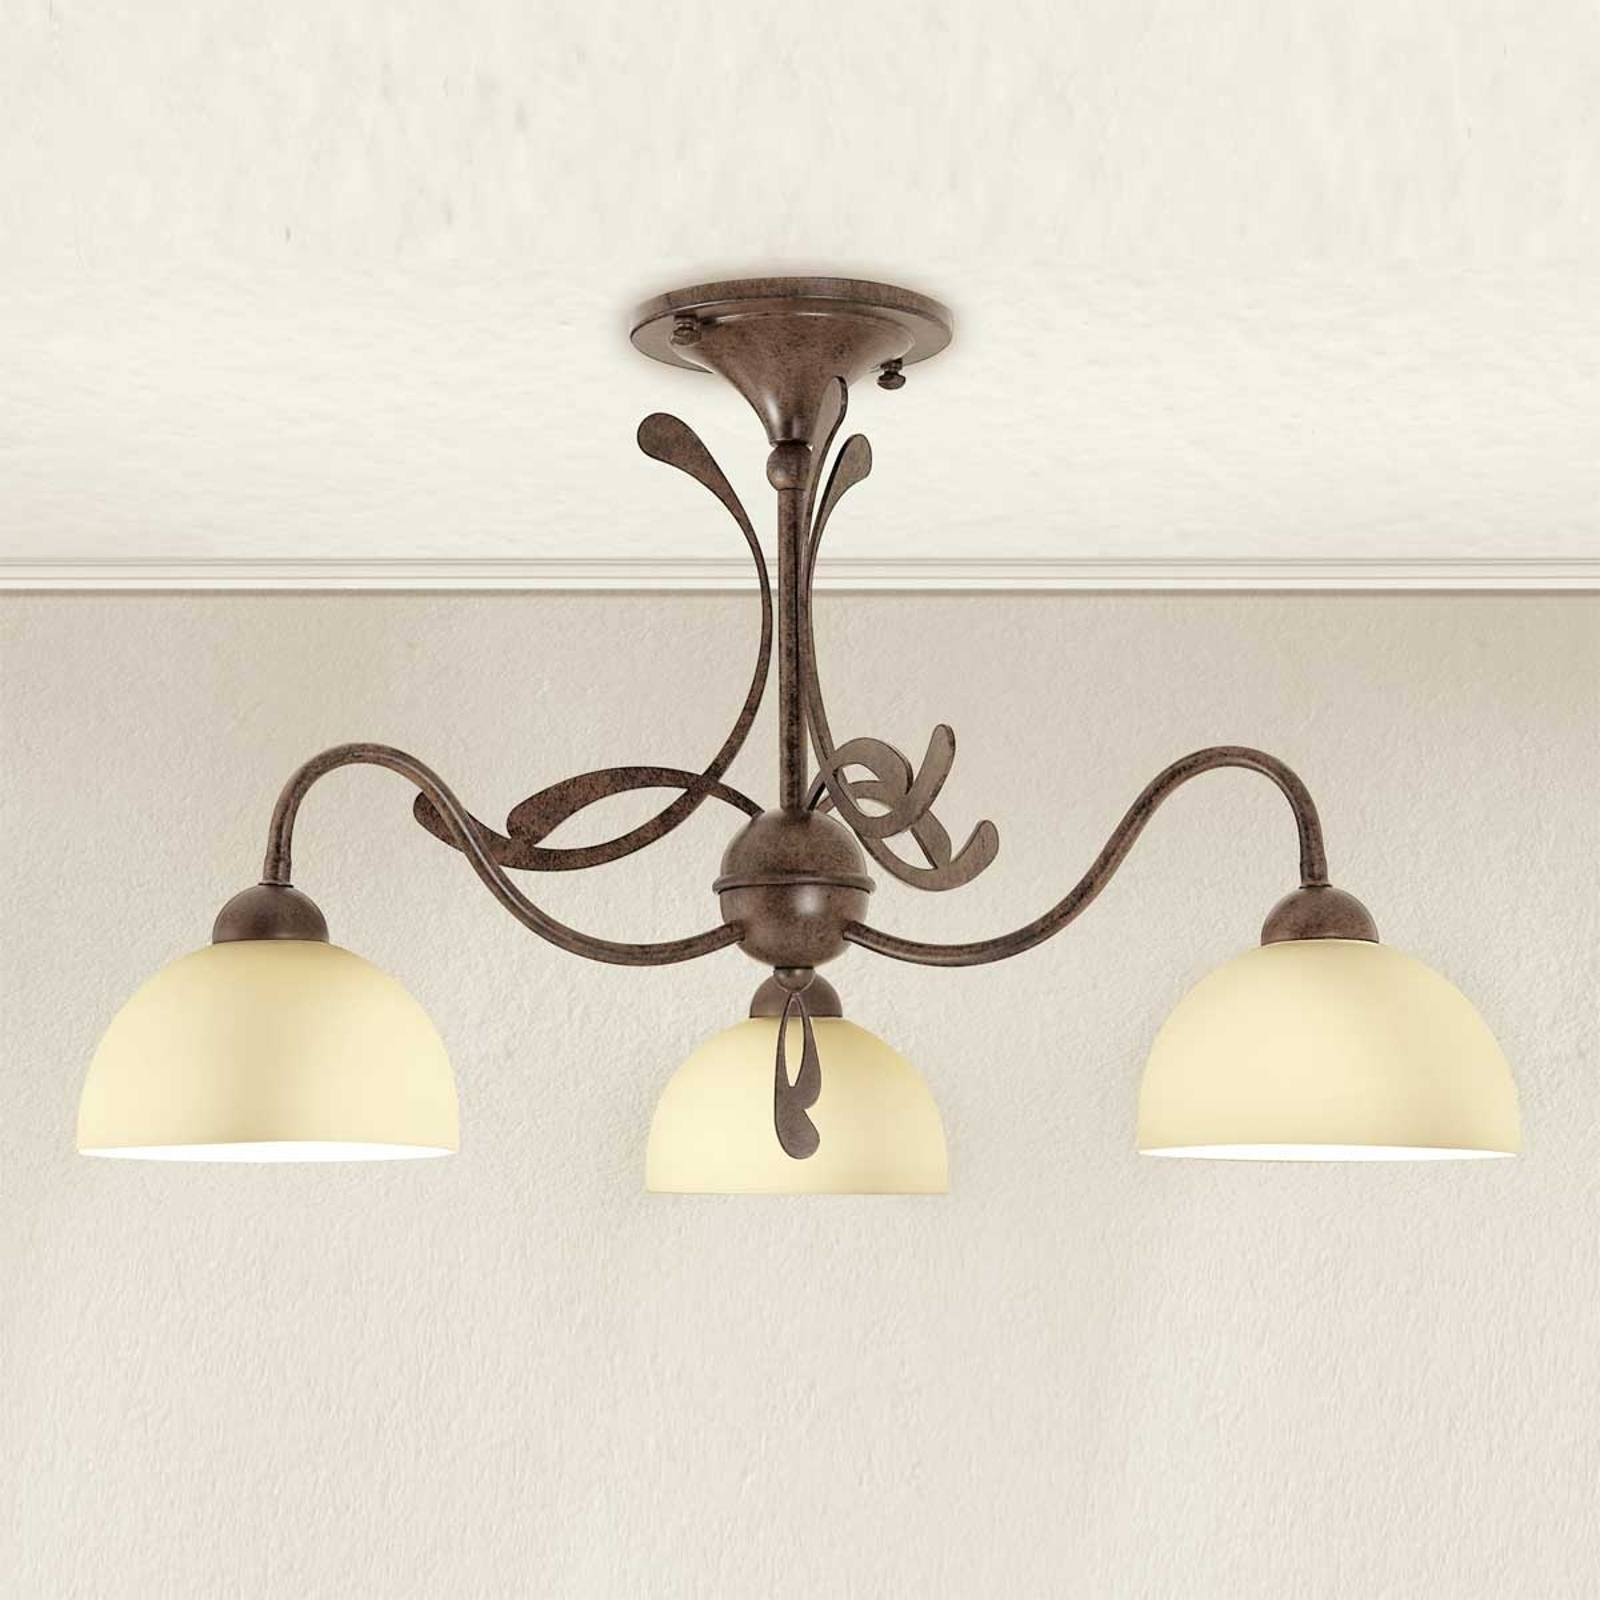 Meerlichts plafondlamp Lorenzo